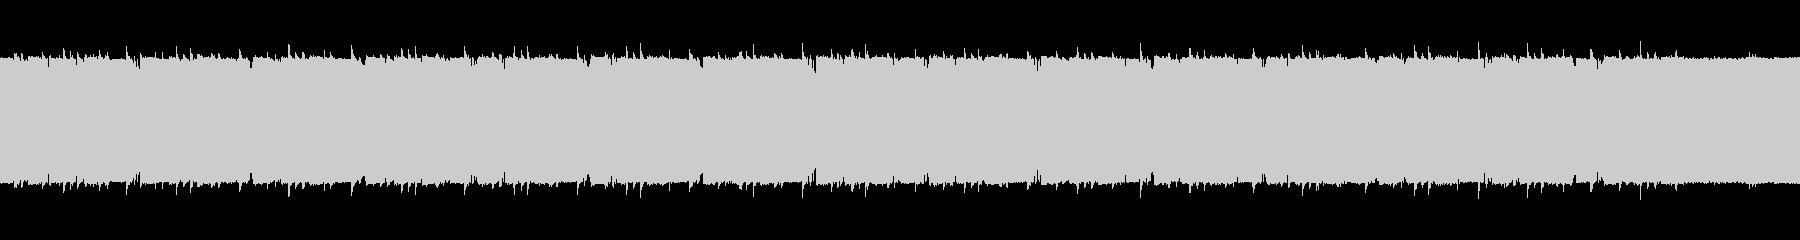 bpm137地味で不気味なループテクノの未再生の波形